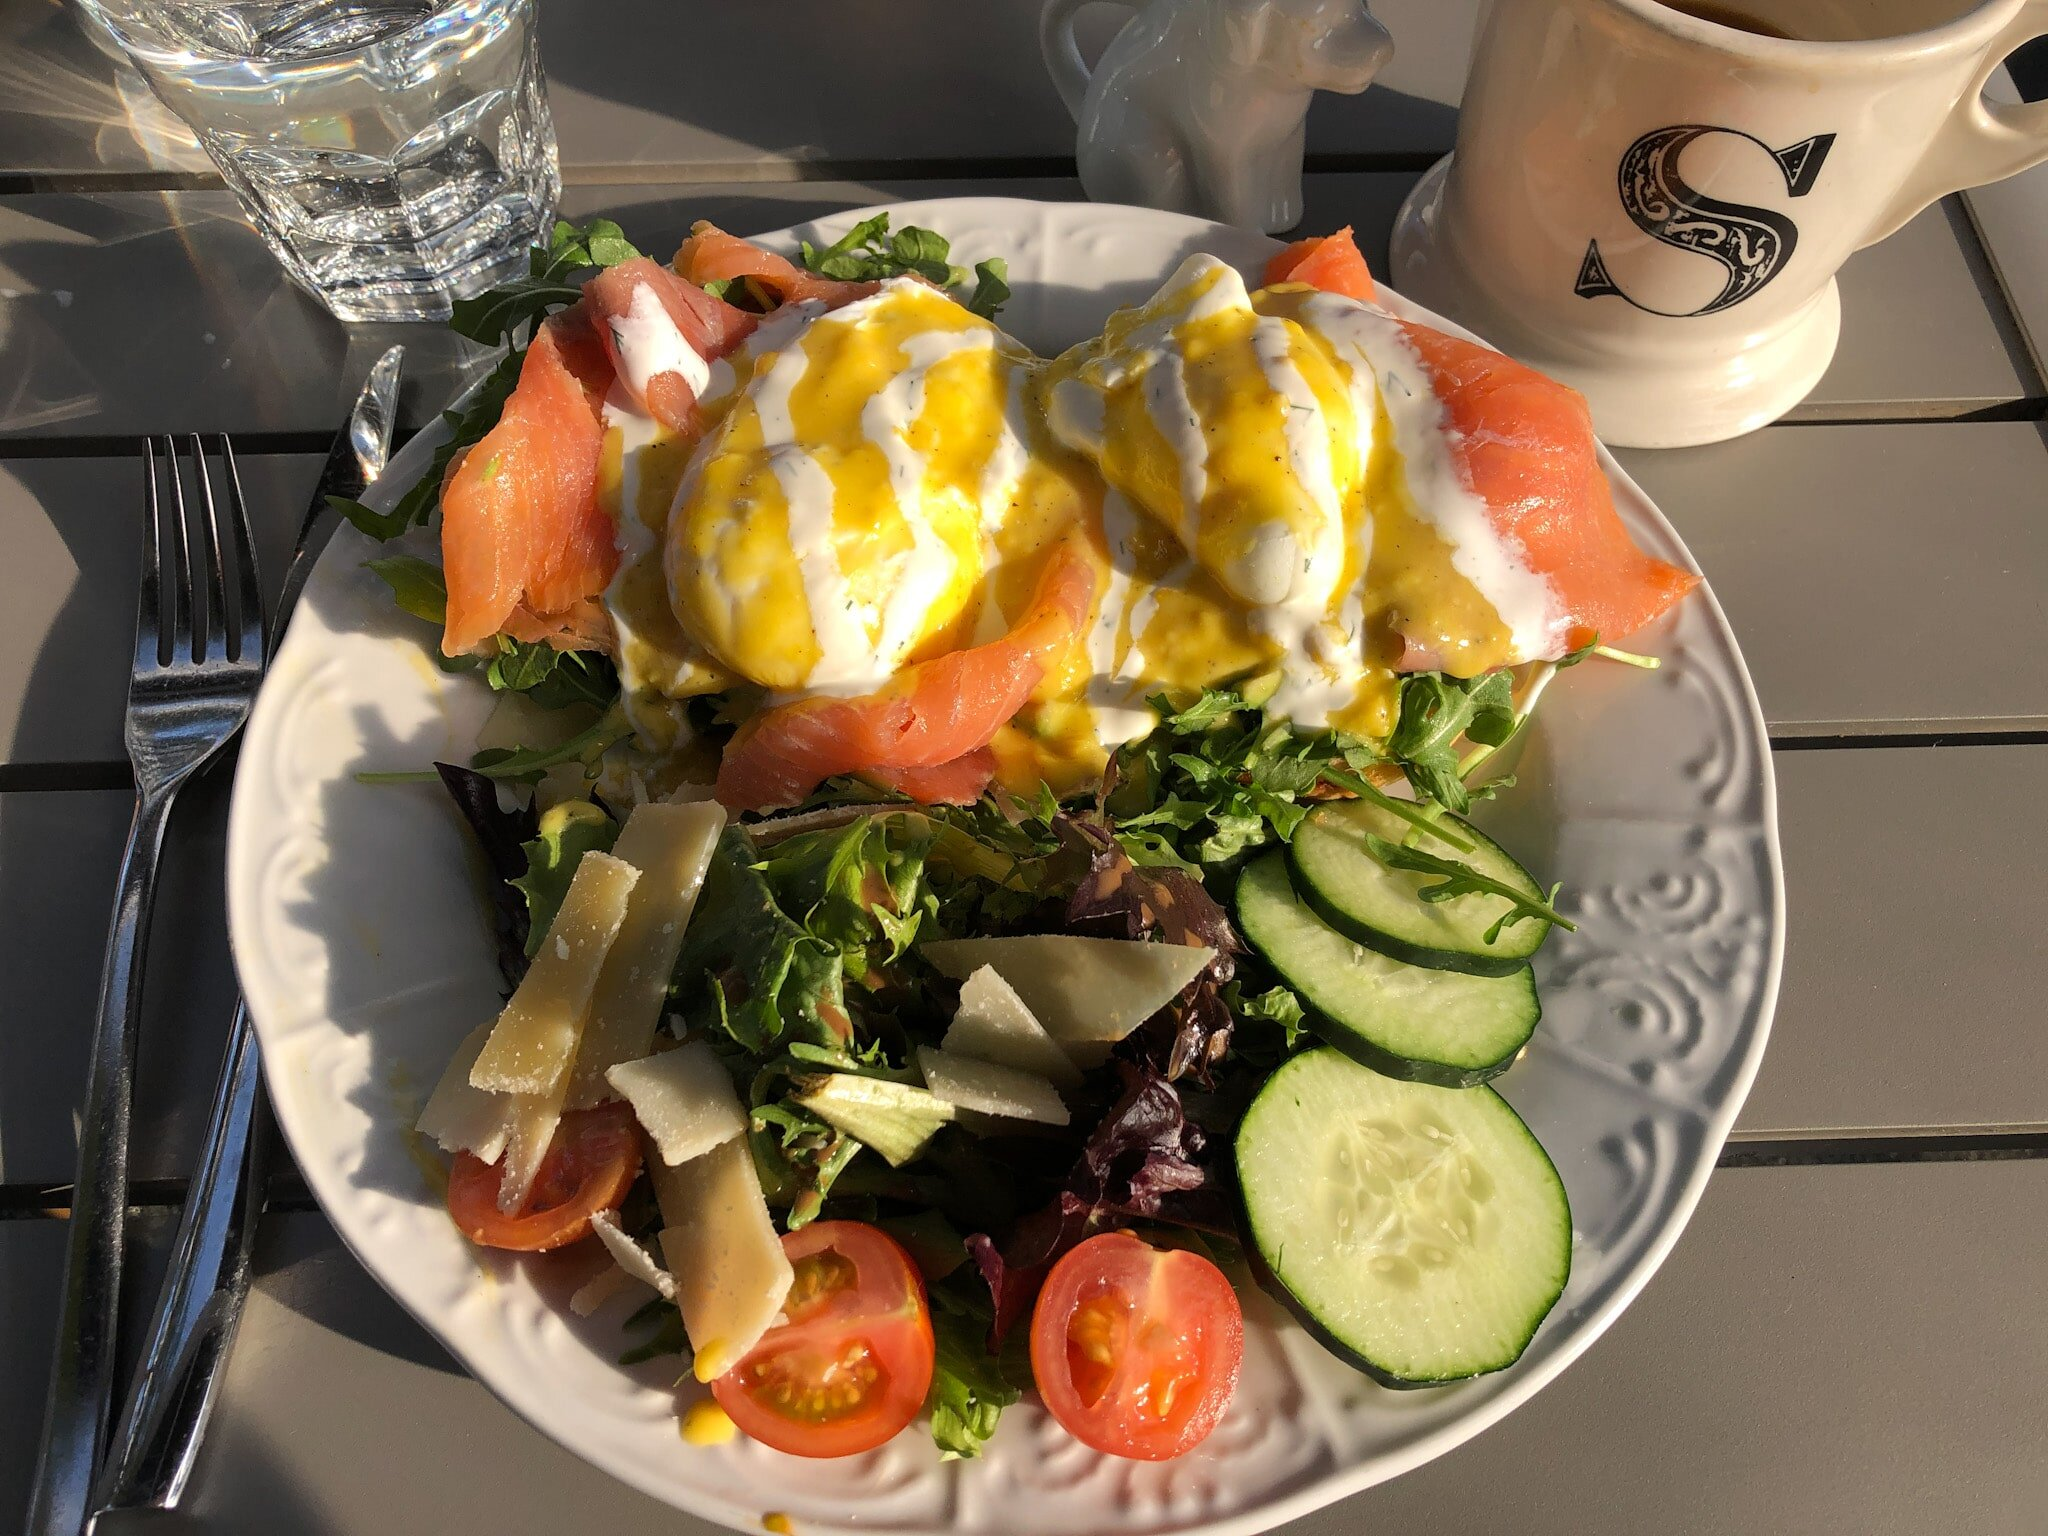 Breakfast in La Jolla at Sugar and Scribe